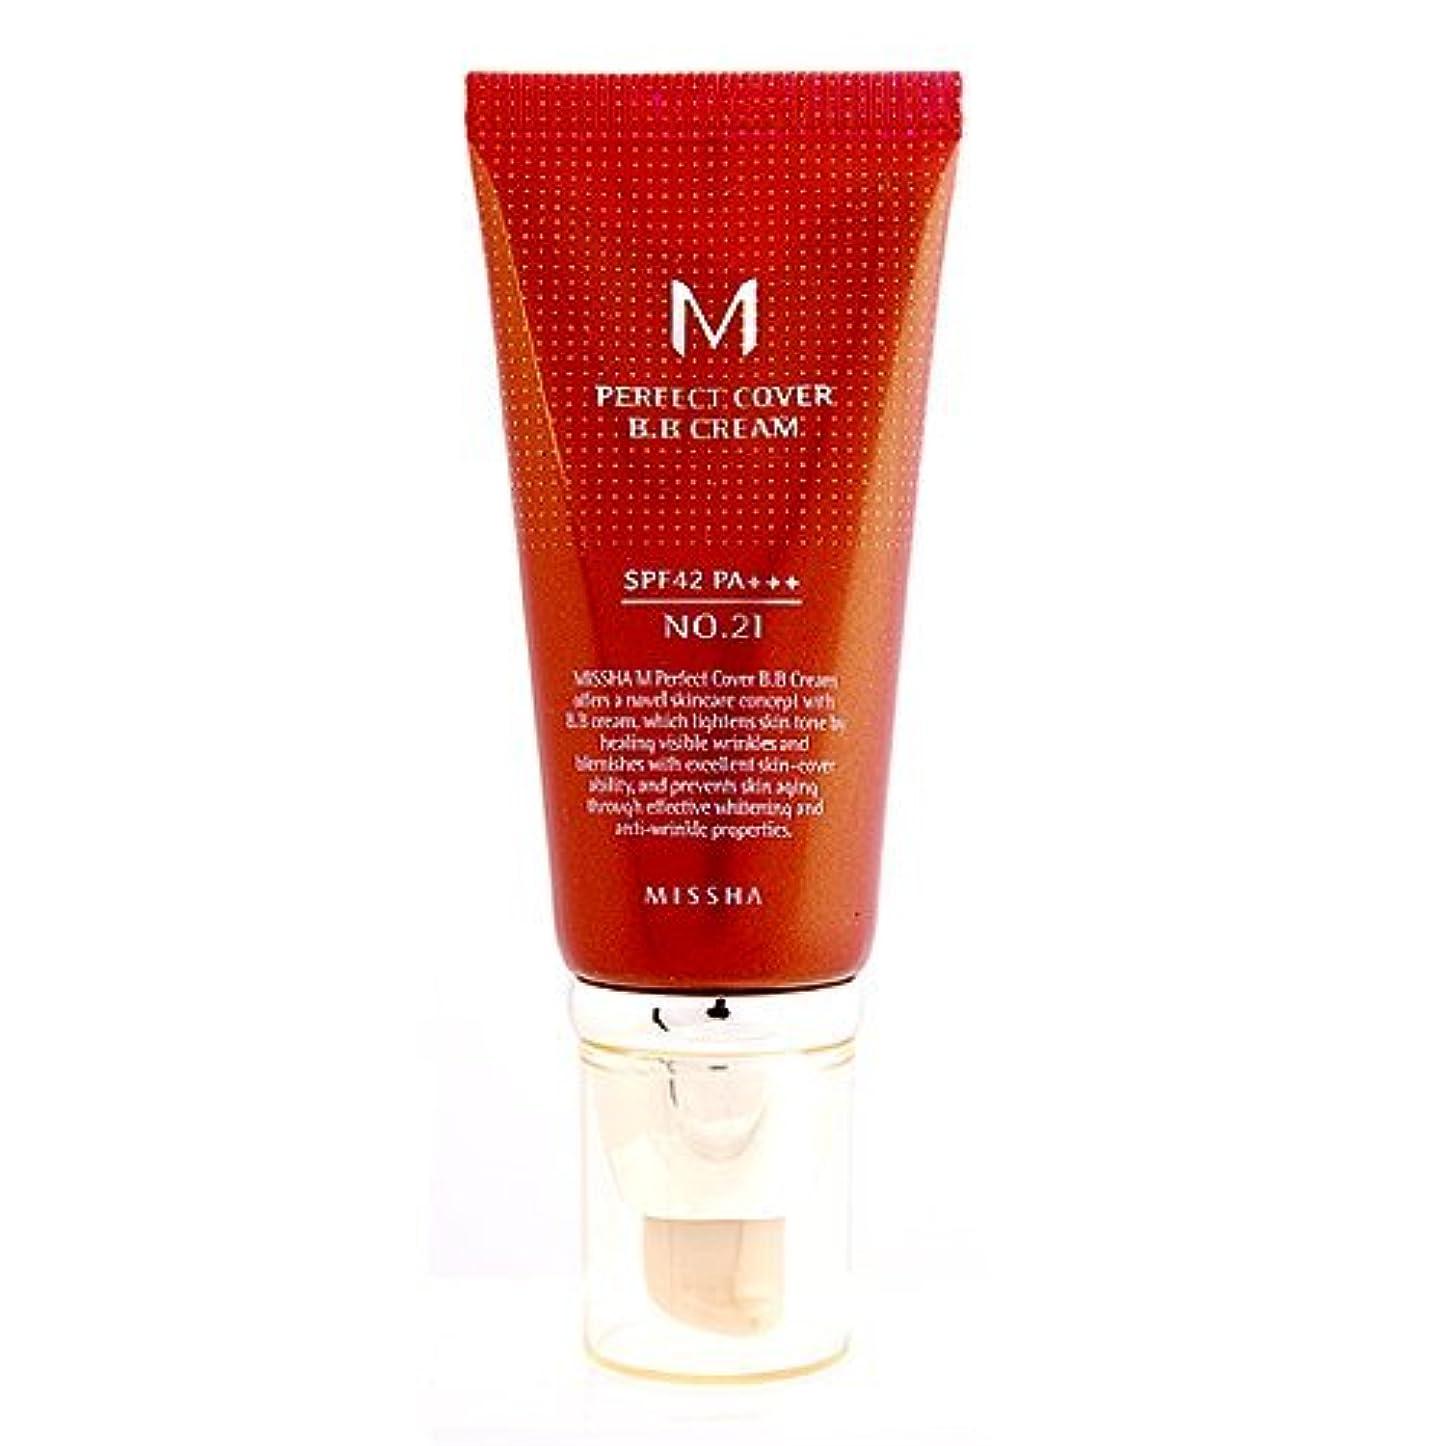 法令展示会鷲Missha M Perfect Cover B.B. Cream SPF 42 PA+++ 21 Light Beige, 1.69oz, 50ml